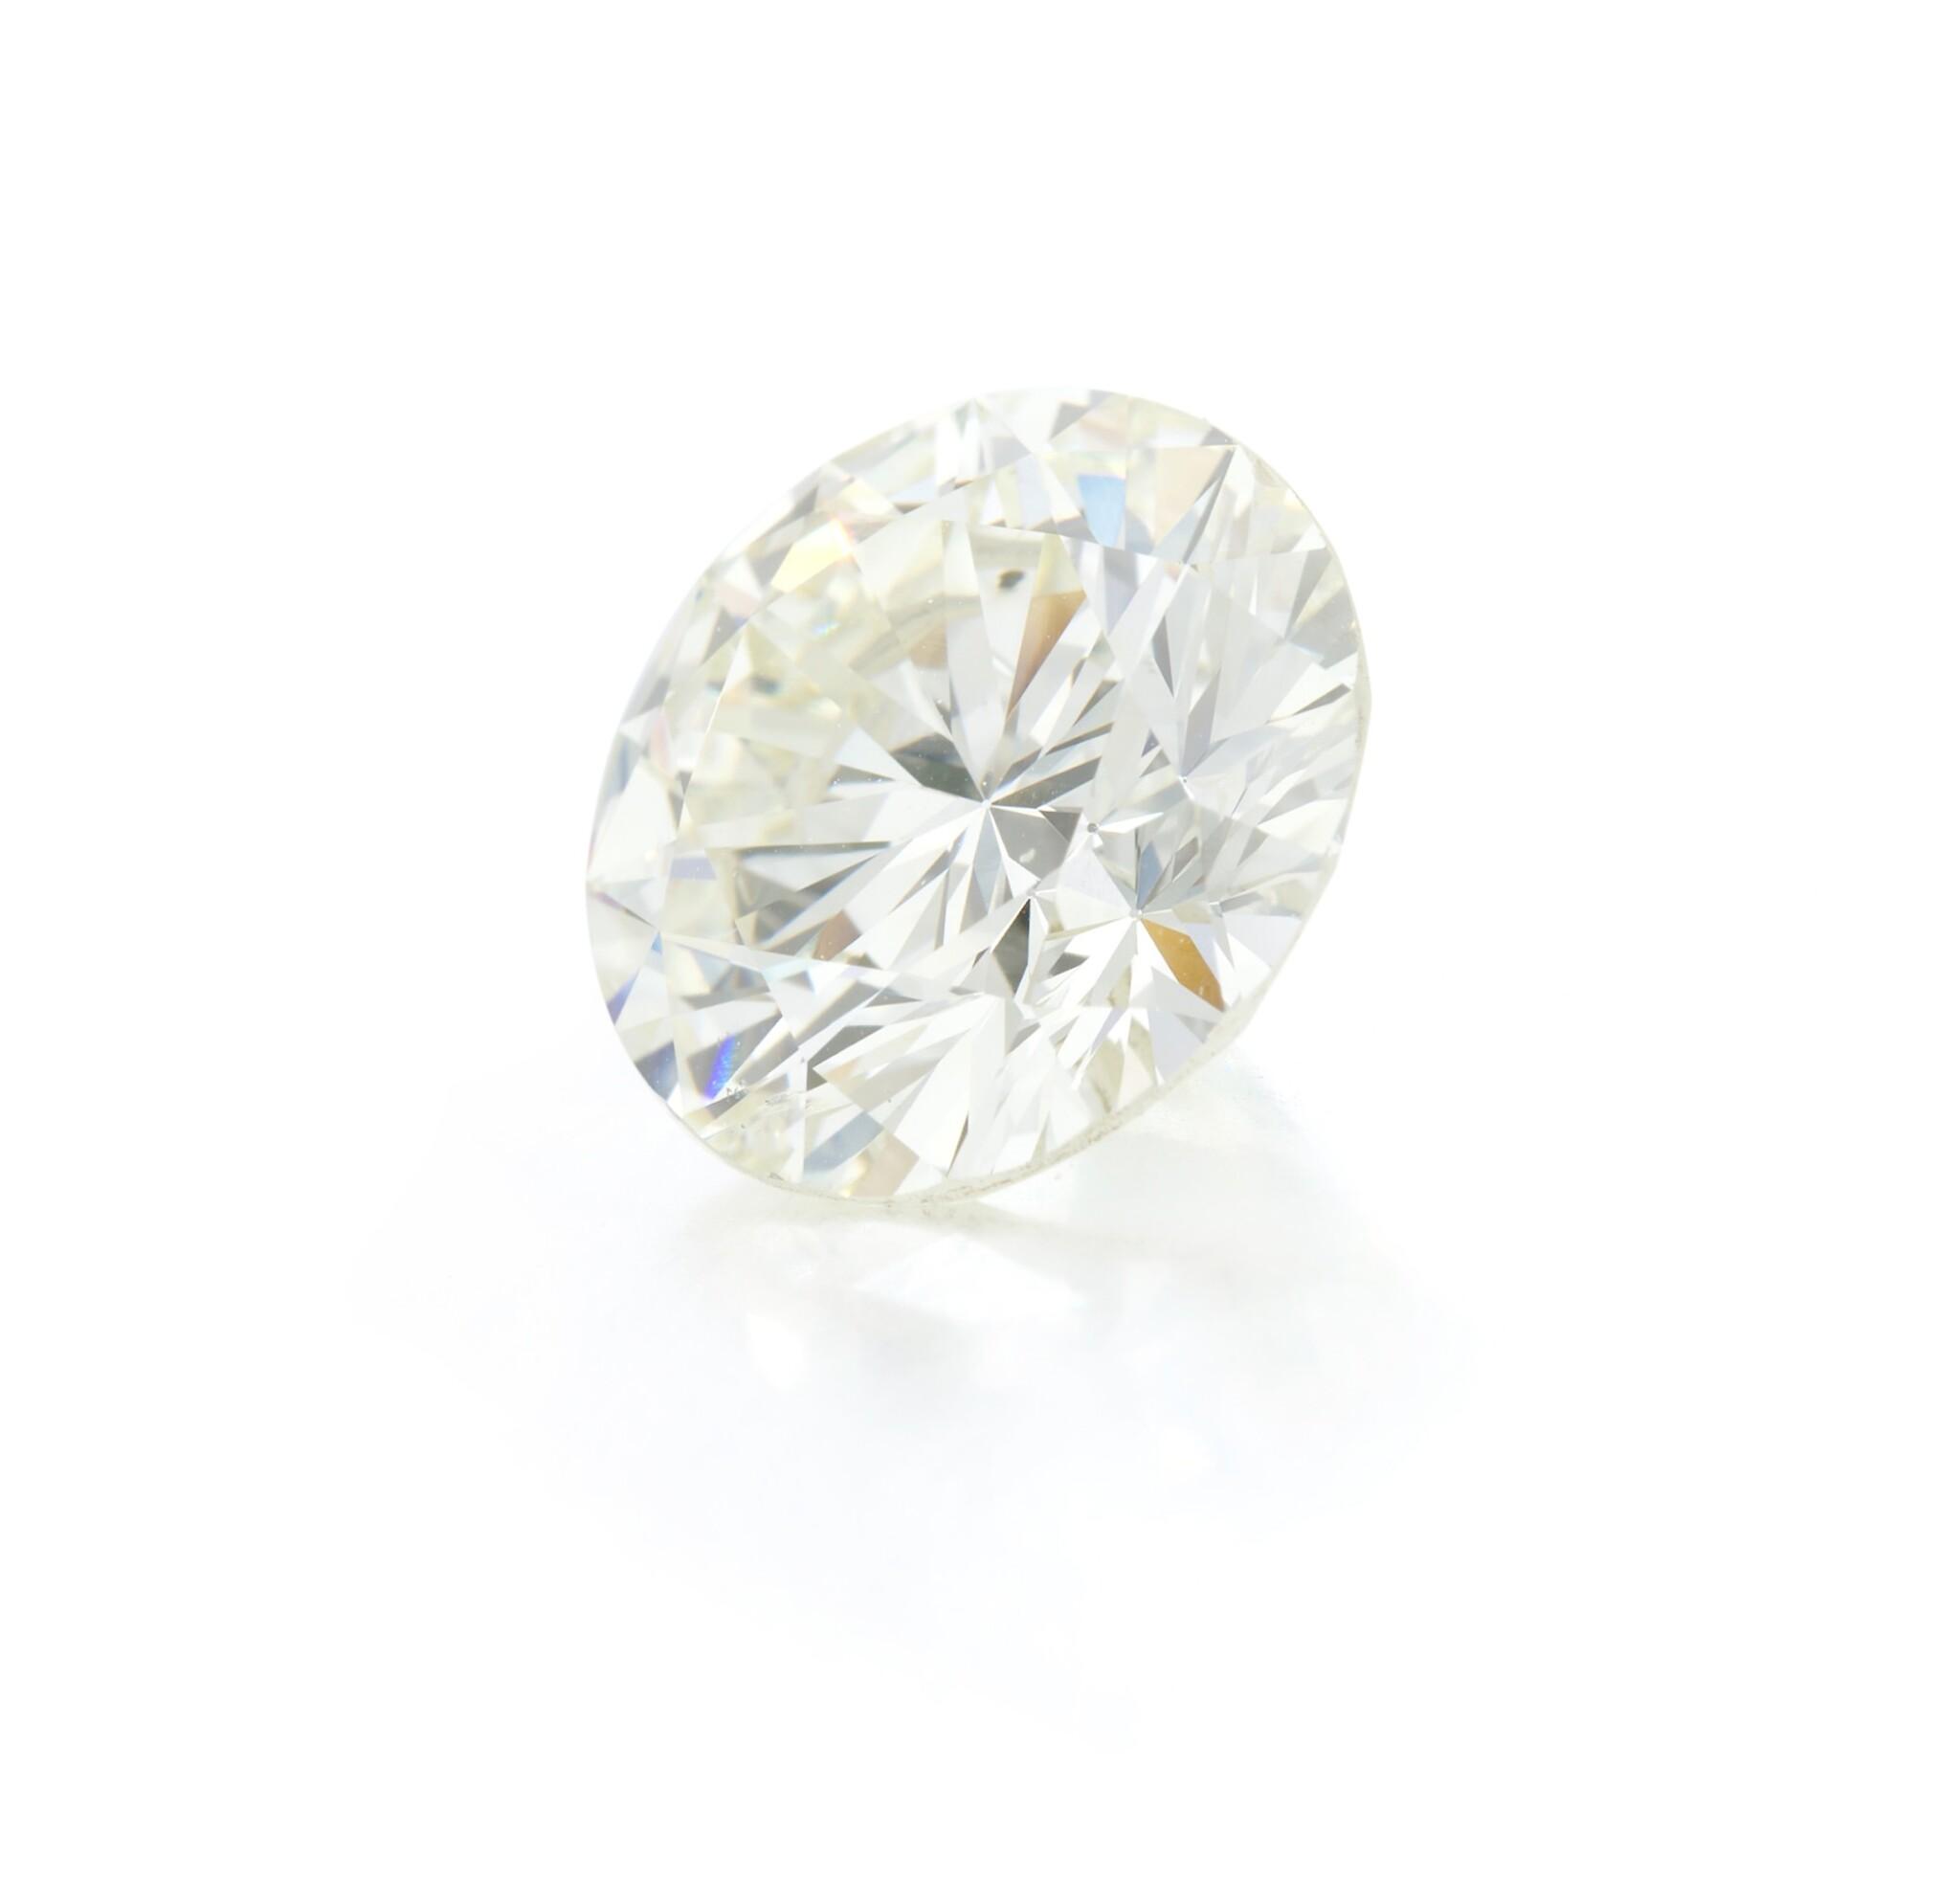 View 1 of Lot 78. Diamond and ring mounting (Anello con diamanti).